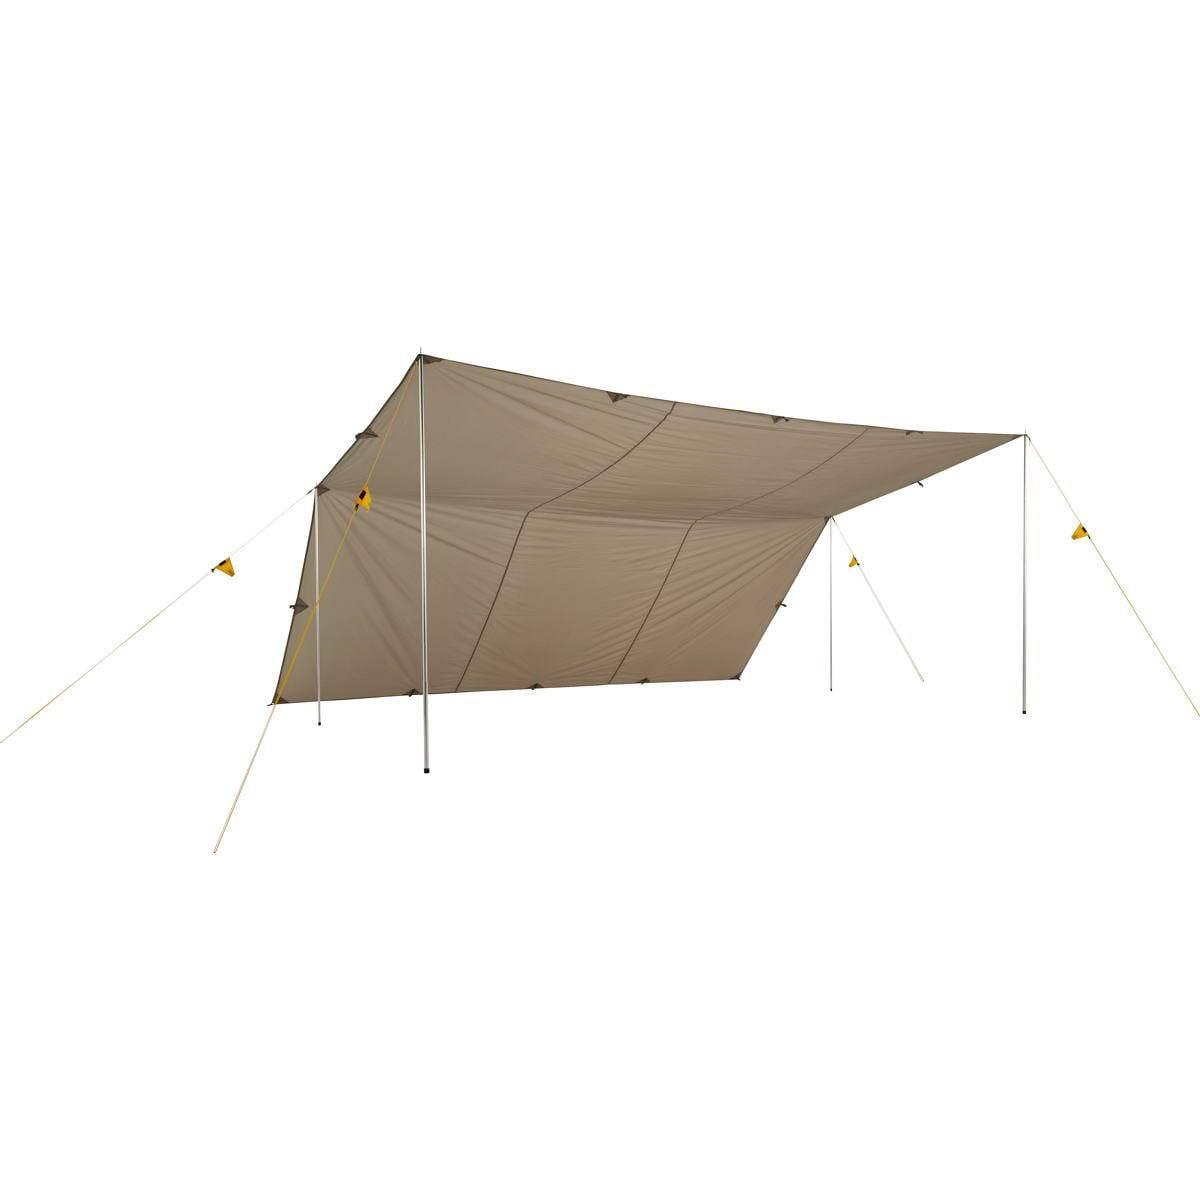 Wechsel Tents Tarp L - Travel Line oak - Bild 4